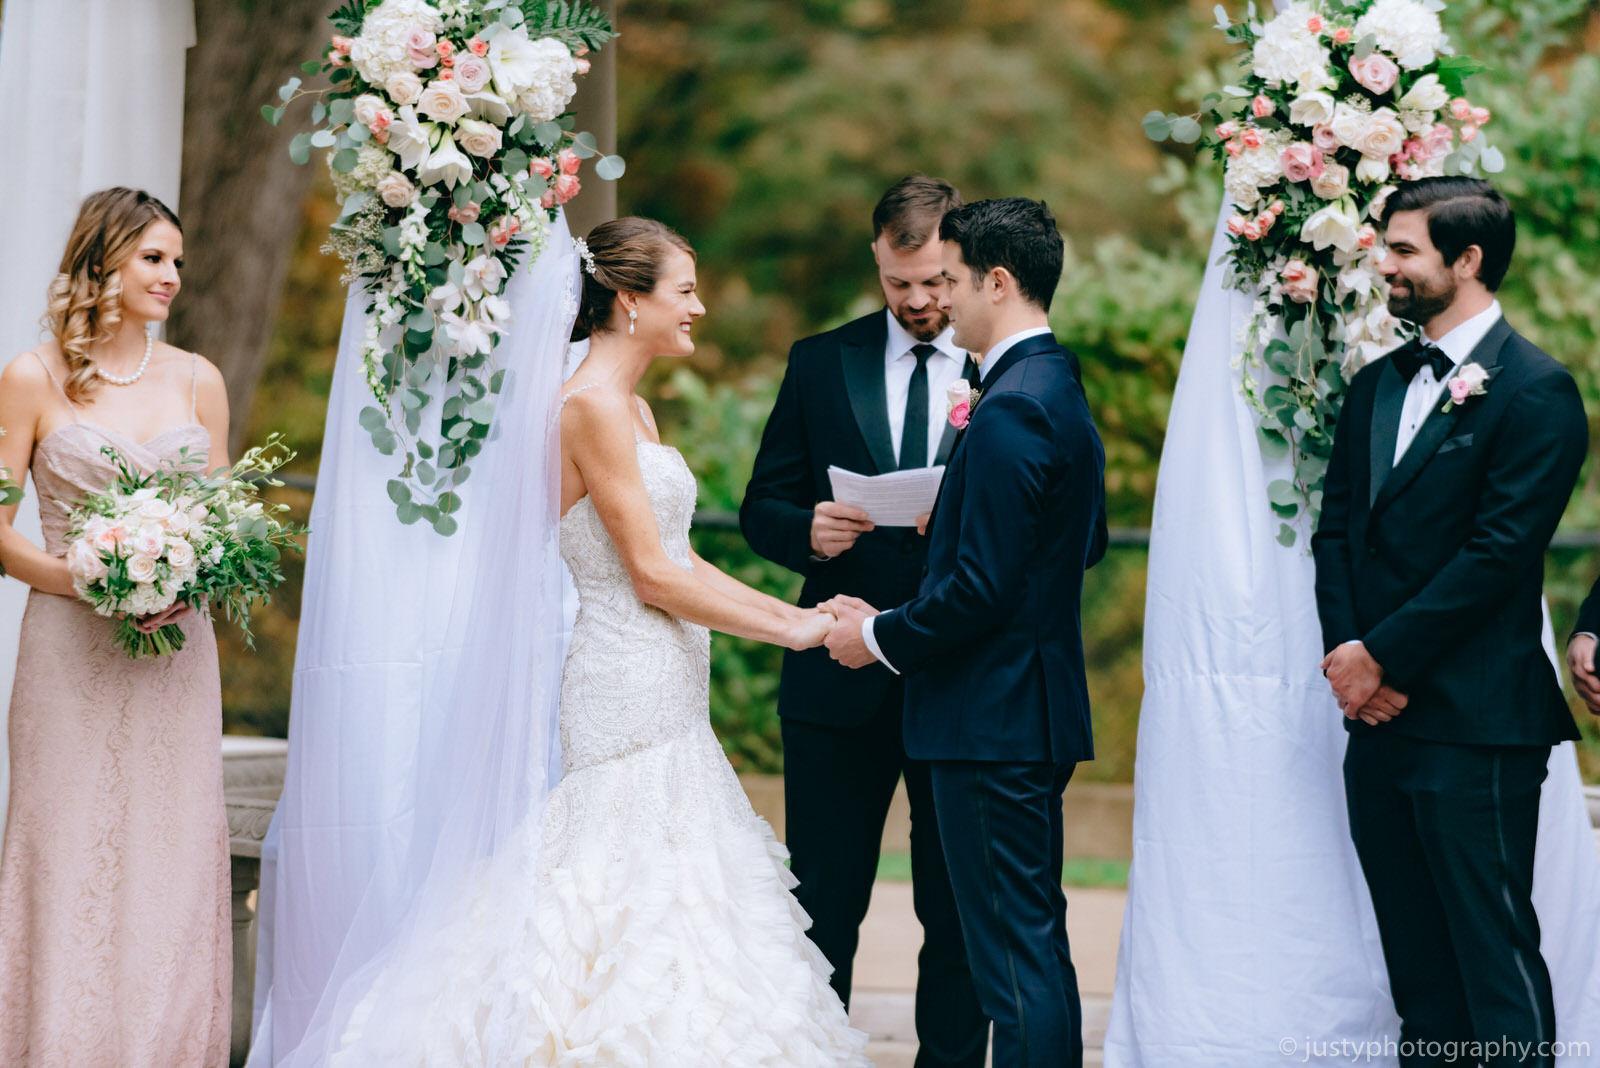 Omni Shoreham wedding photos-washington-dc-wedding-venues (119 of 171).jpg